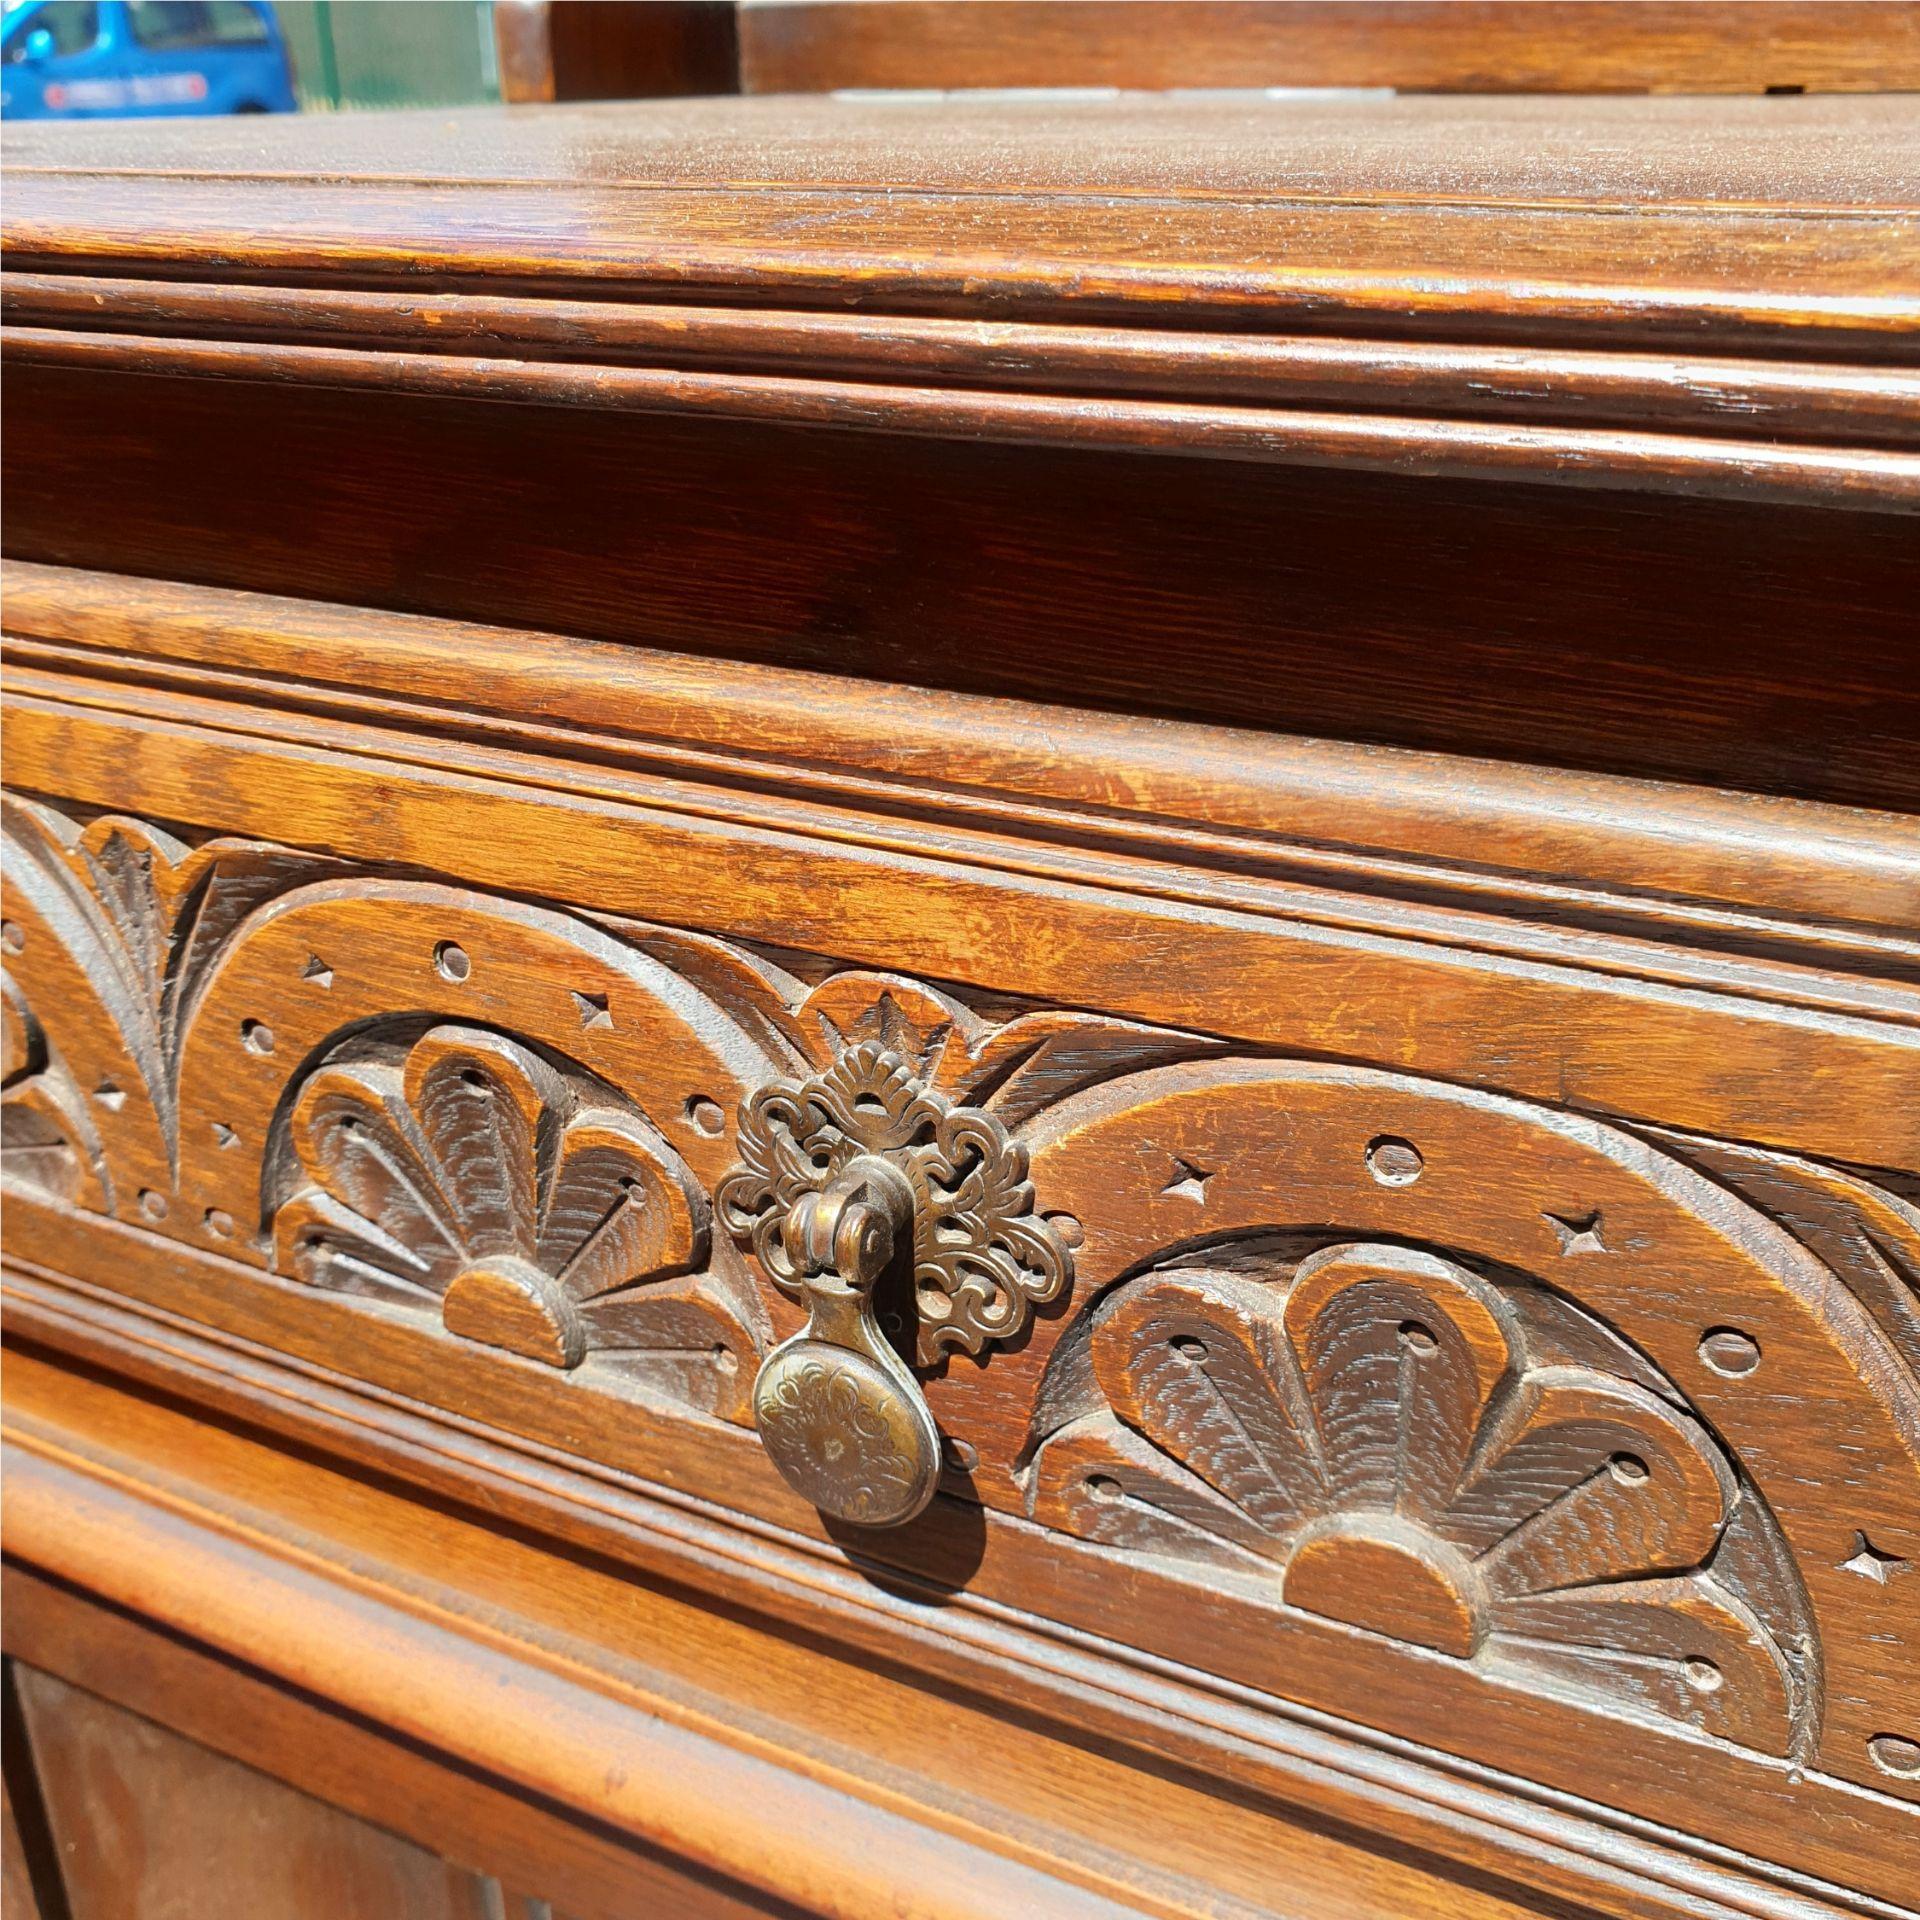 Vintage Mid Century Hardwood Welsh Style Dresser - Image 2 of 3